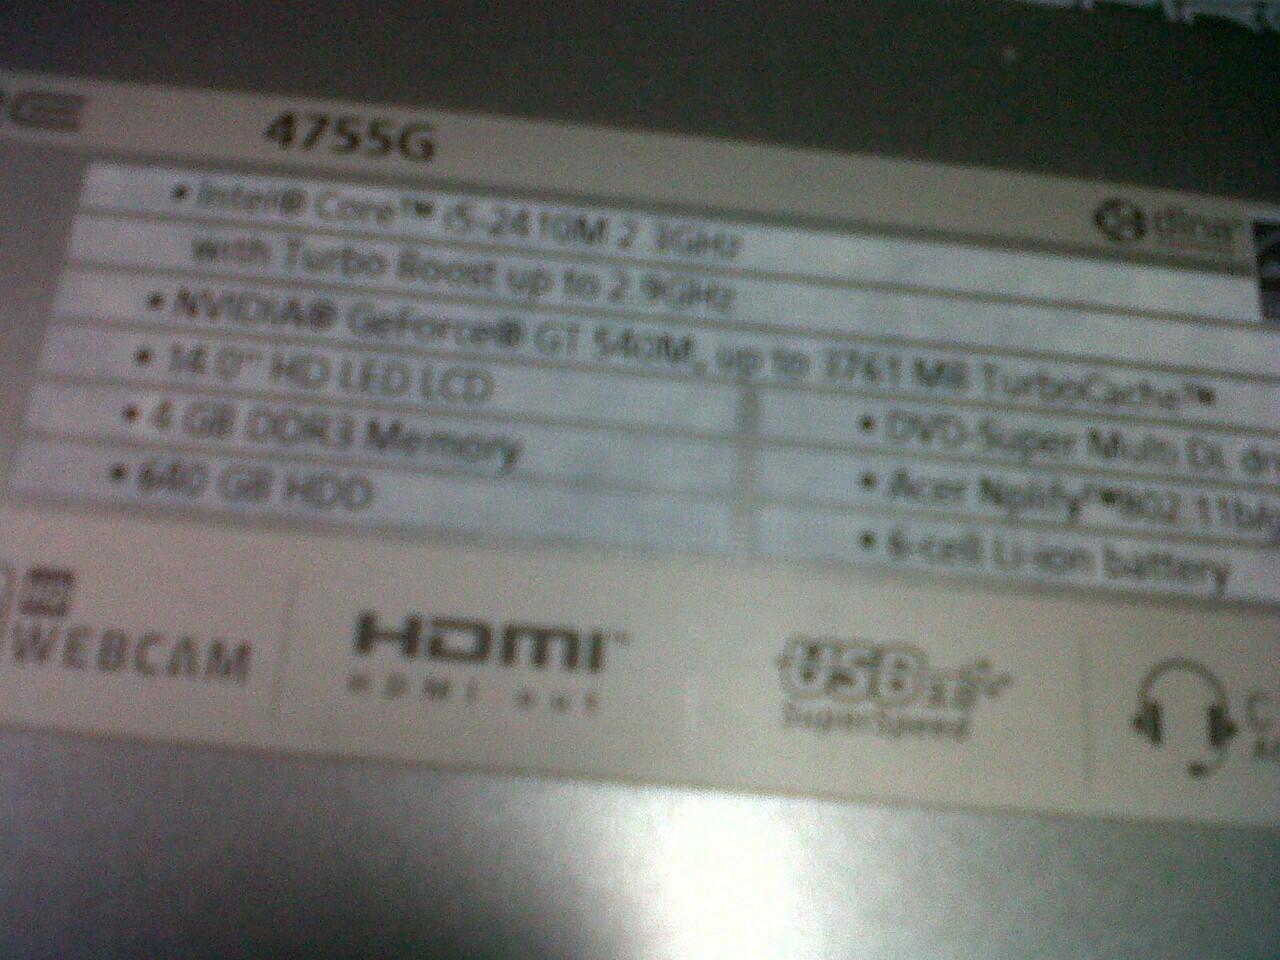 ACER 4755G GAMING COREI5